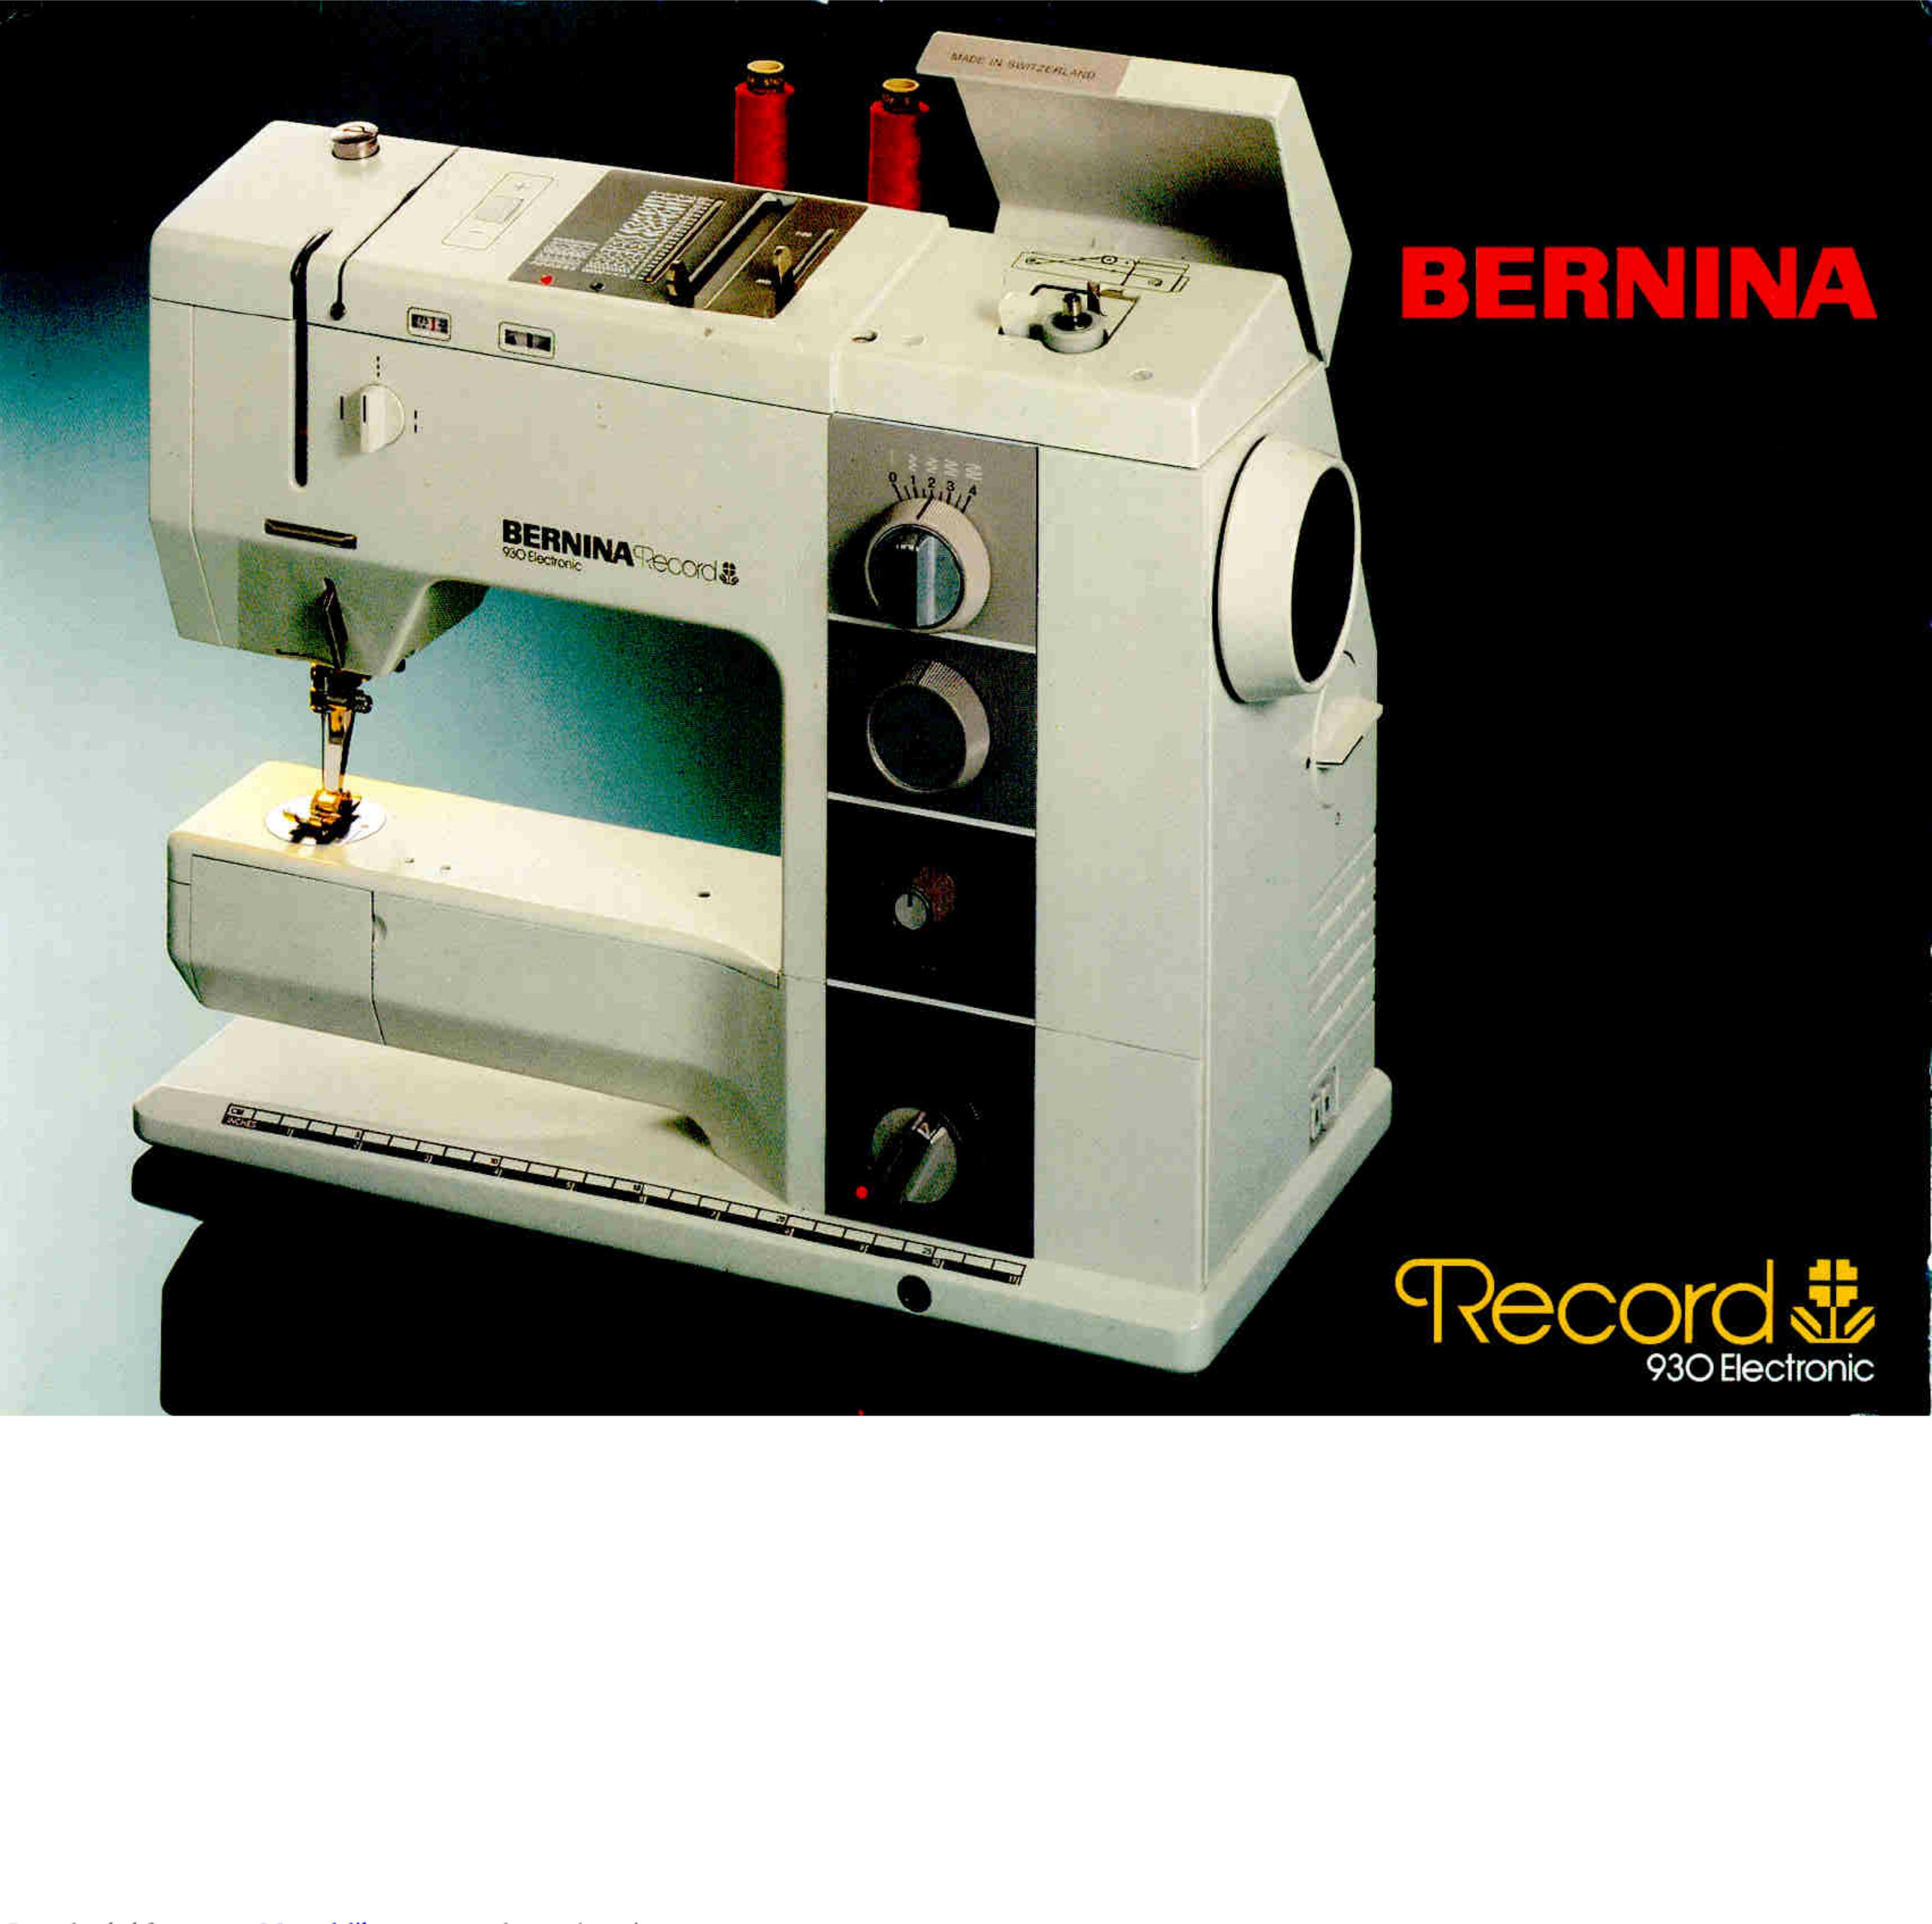 Bernina Record 930 Electronic Manual 1002738